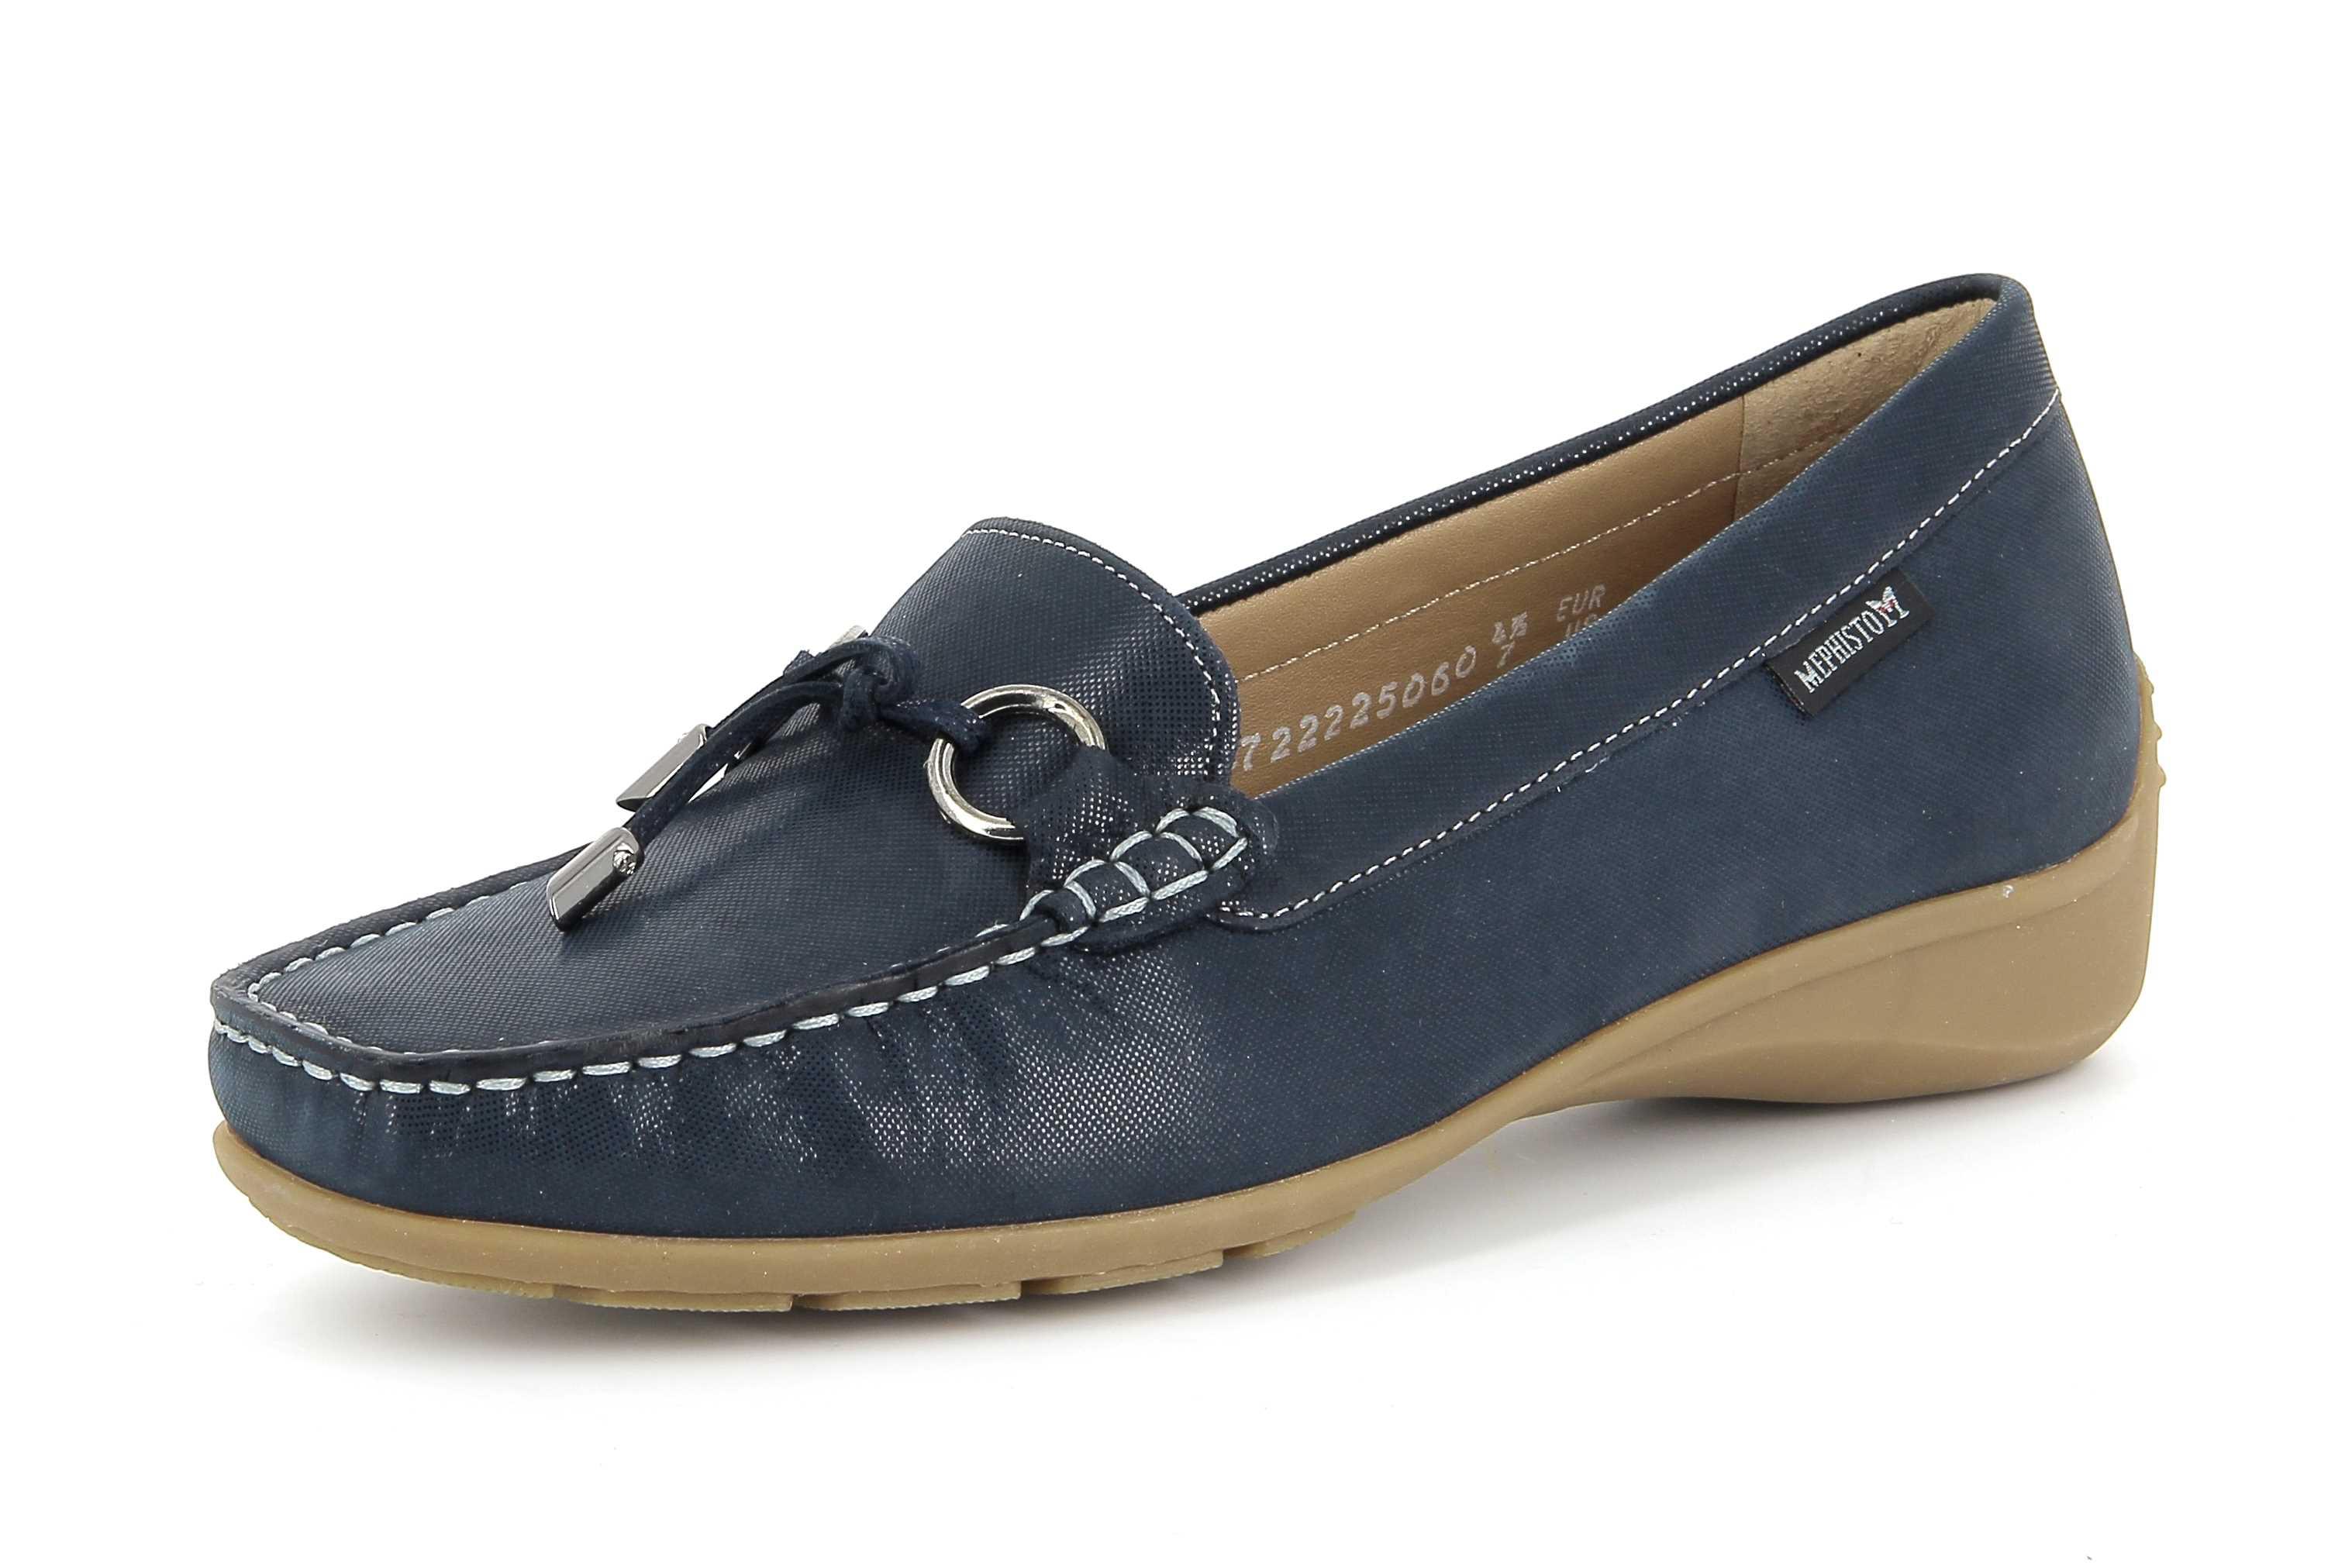 mephisto shop chaussures confortables mocassins femme mod le naomi. Black Bedroom Furniture Sets. Home Design Ideas